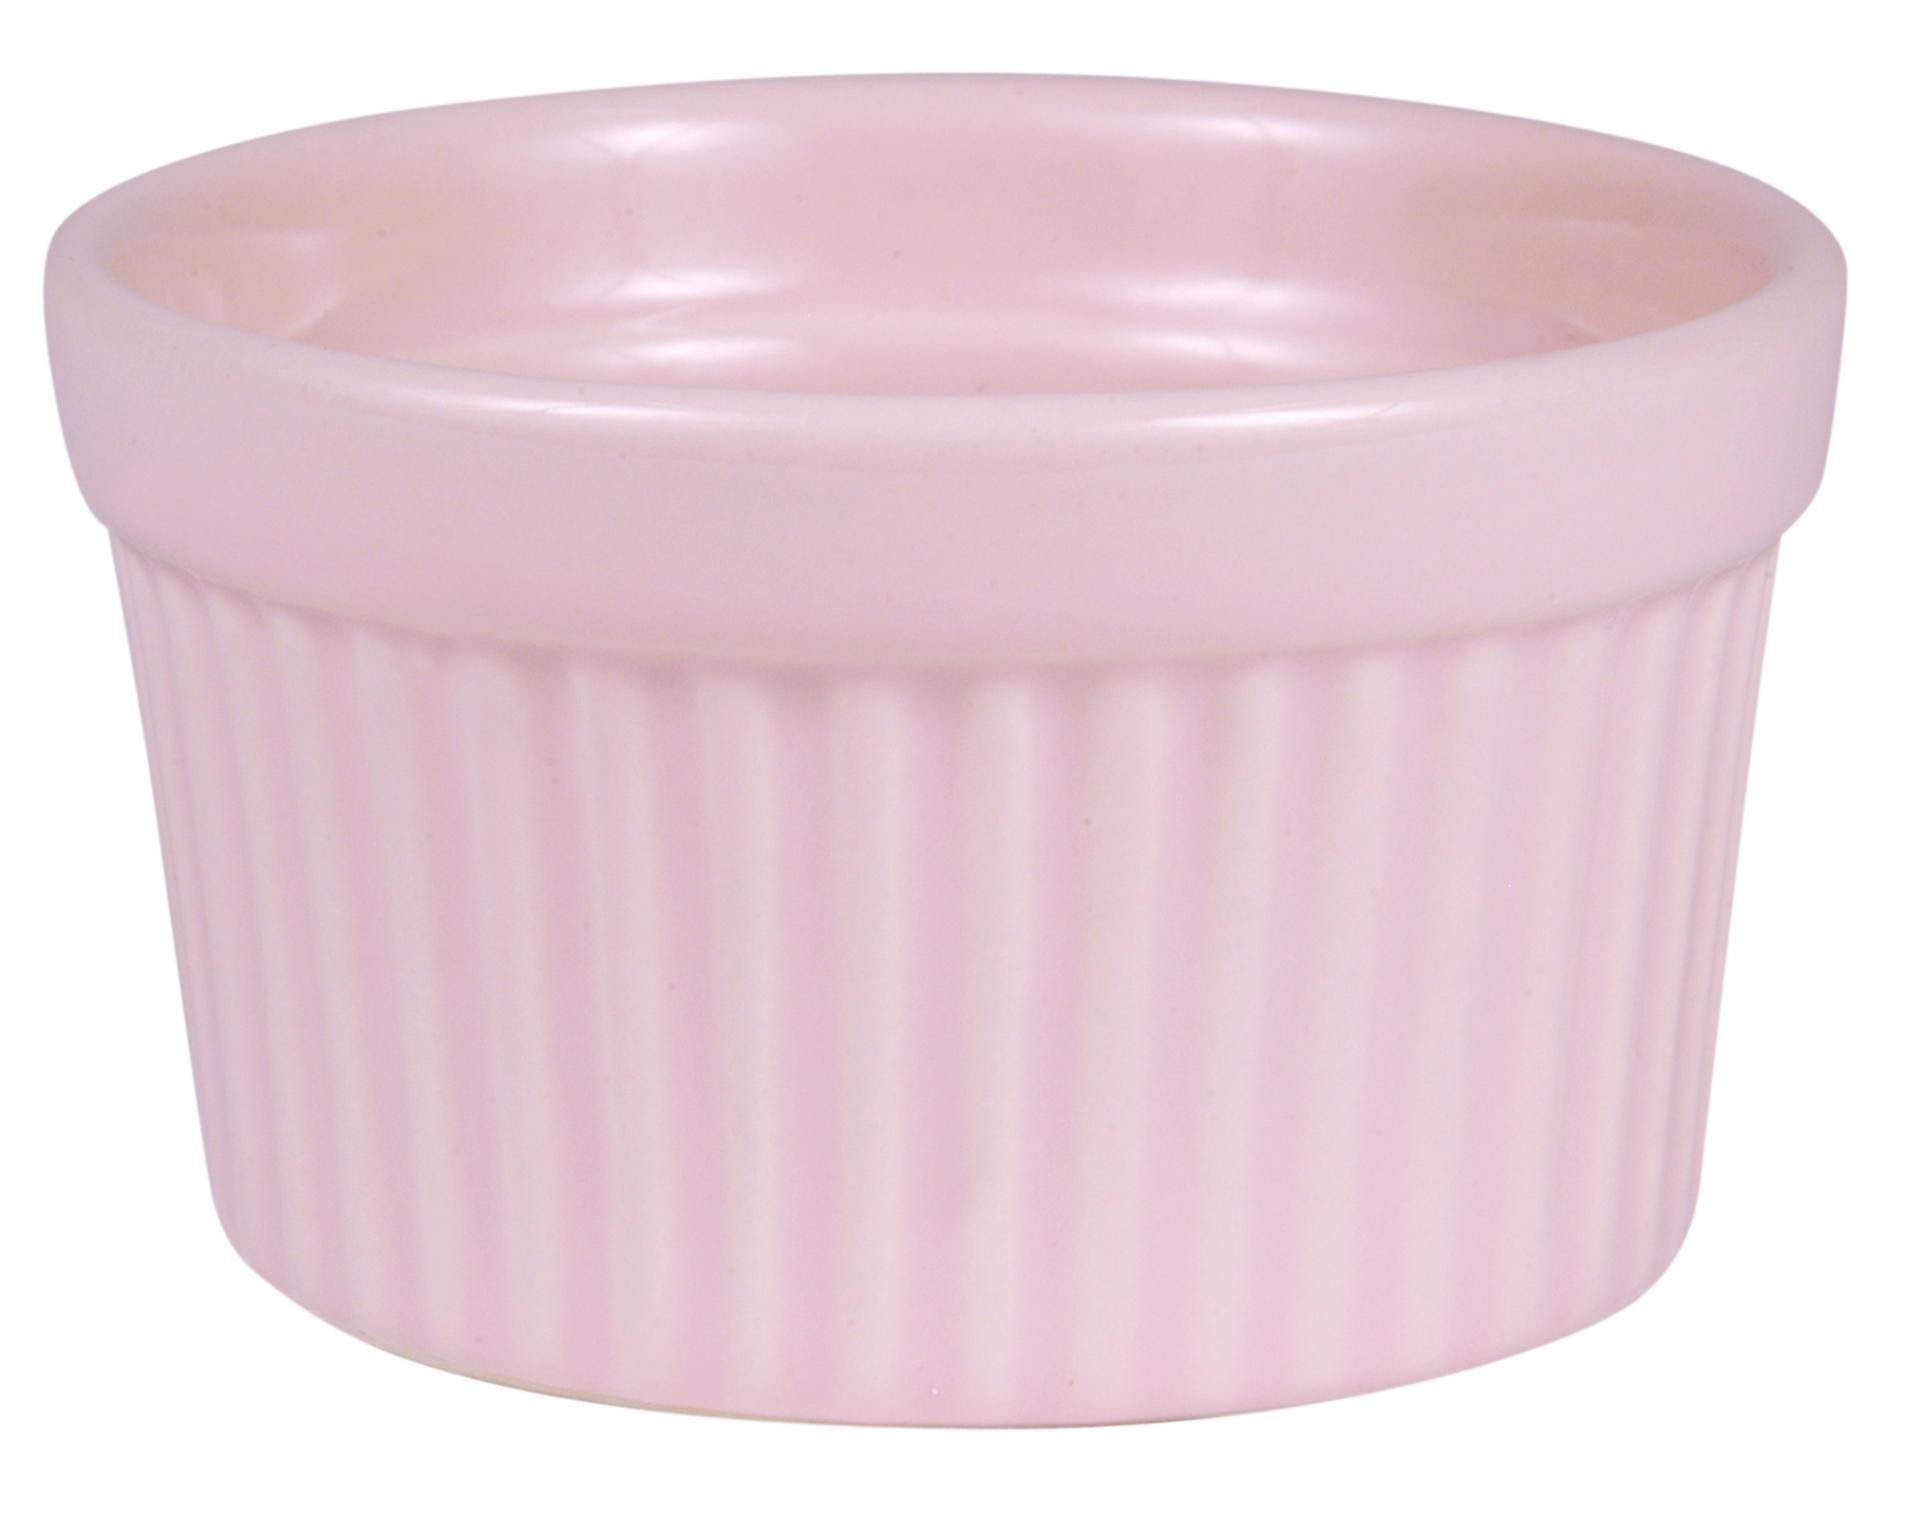 IB LAURSEN Ramekin forma Mynte English Rose, růžová barva, keramika